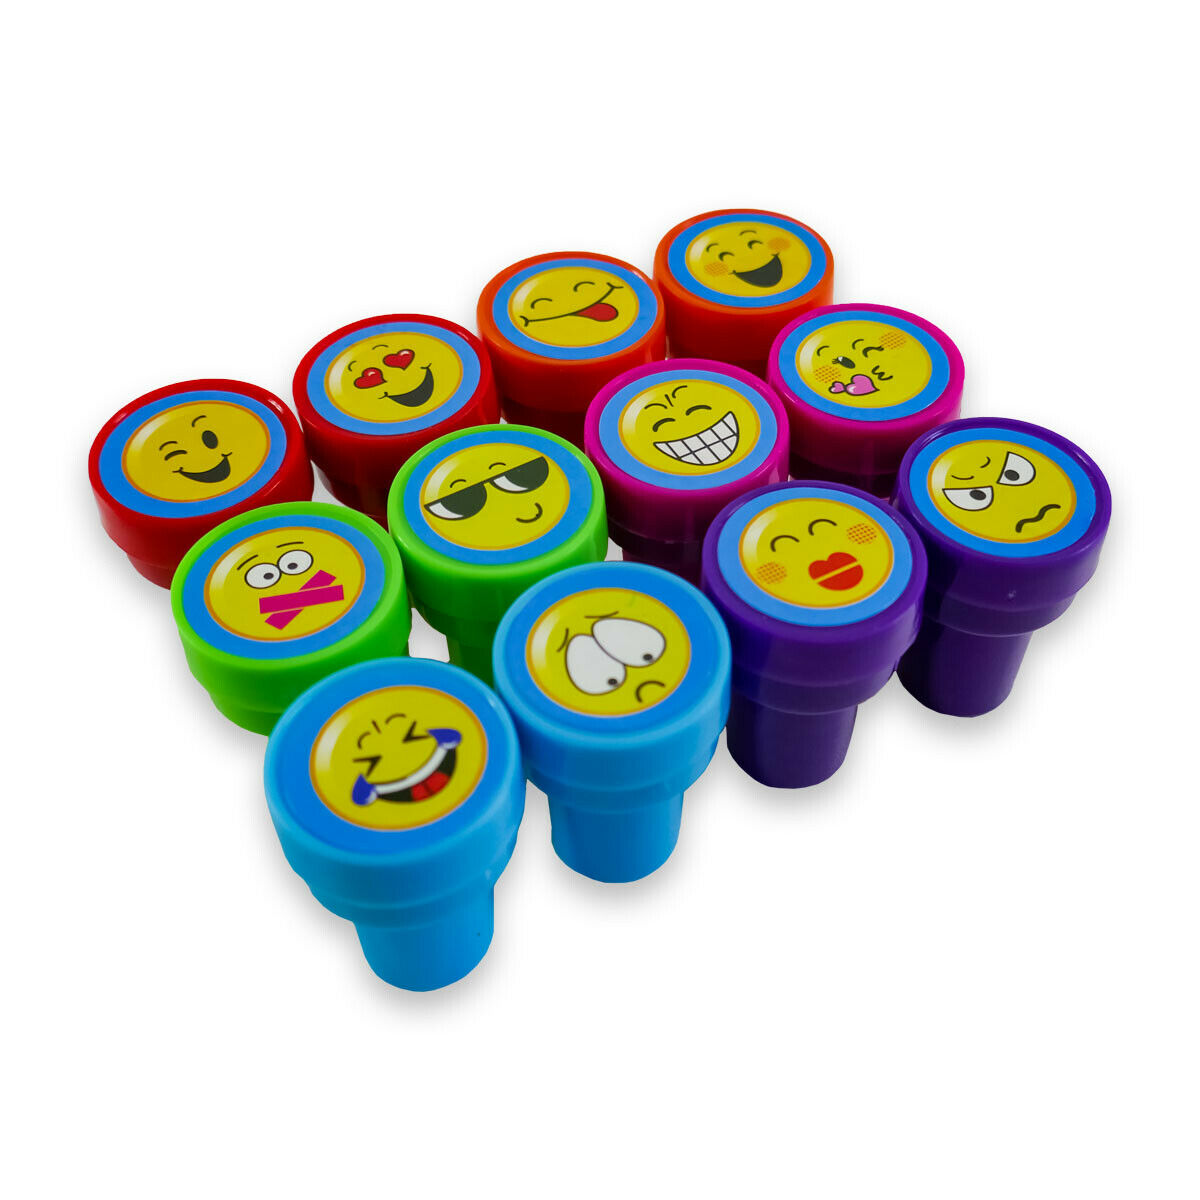 Selbstfärbend Stempelset Tiere 12 Stück Kinder Stempel kreativer Spielspaß